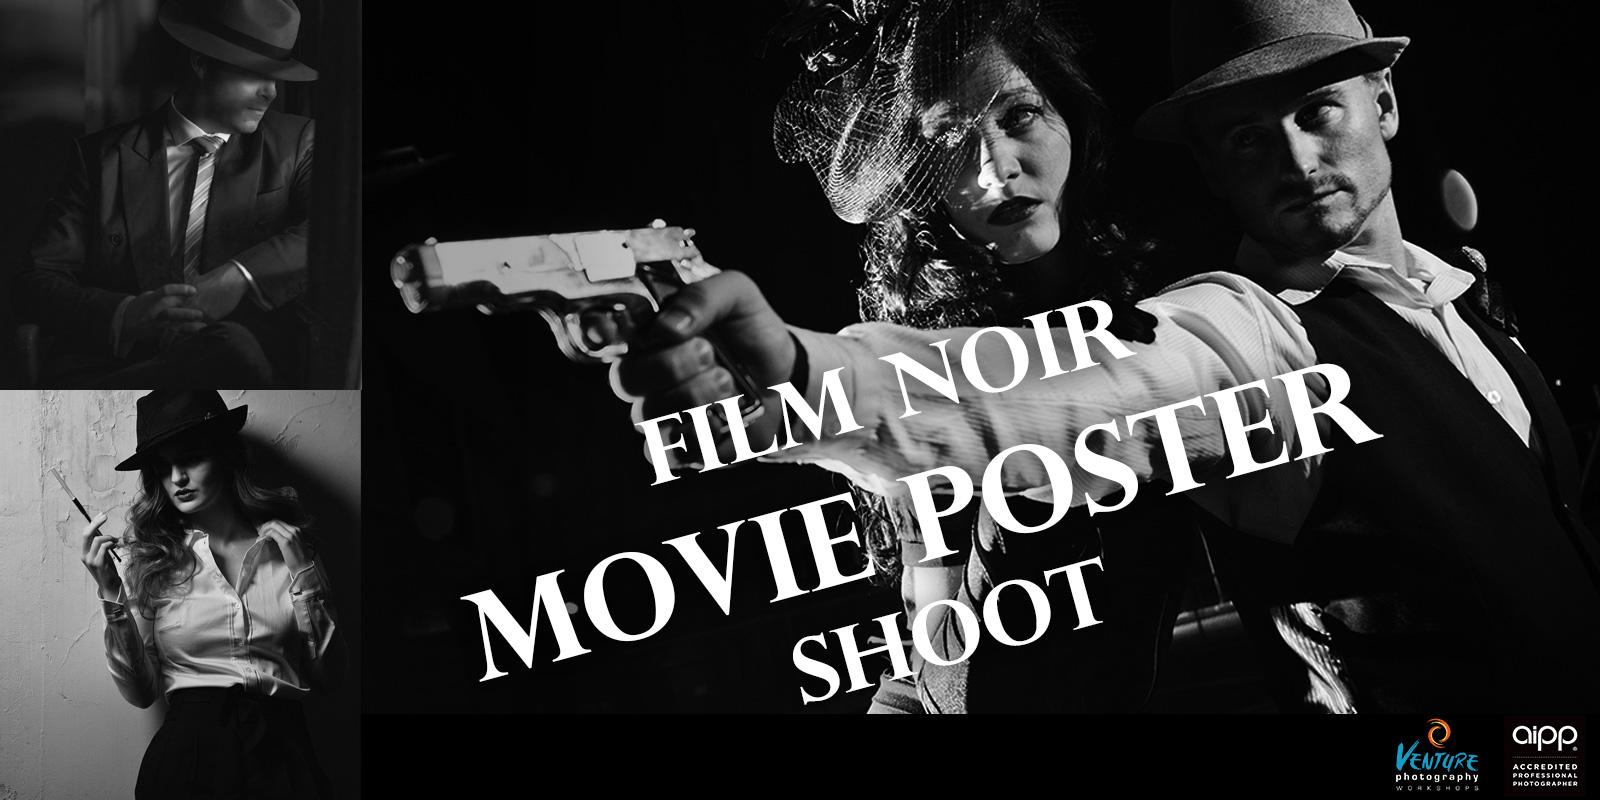 Film Noir Movie Poster Shoot